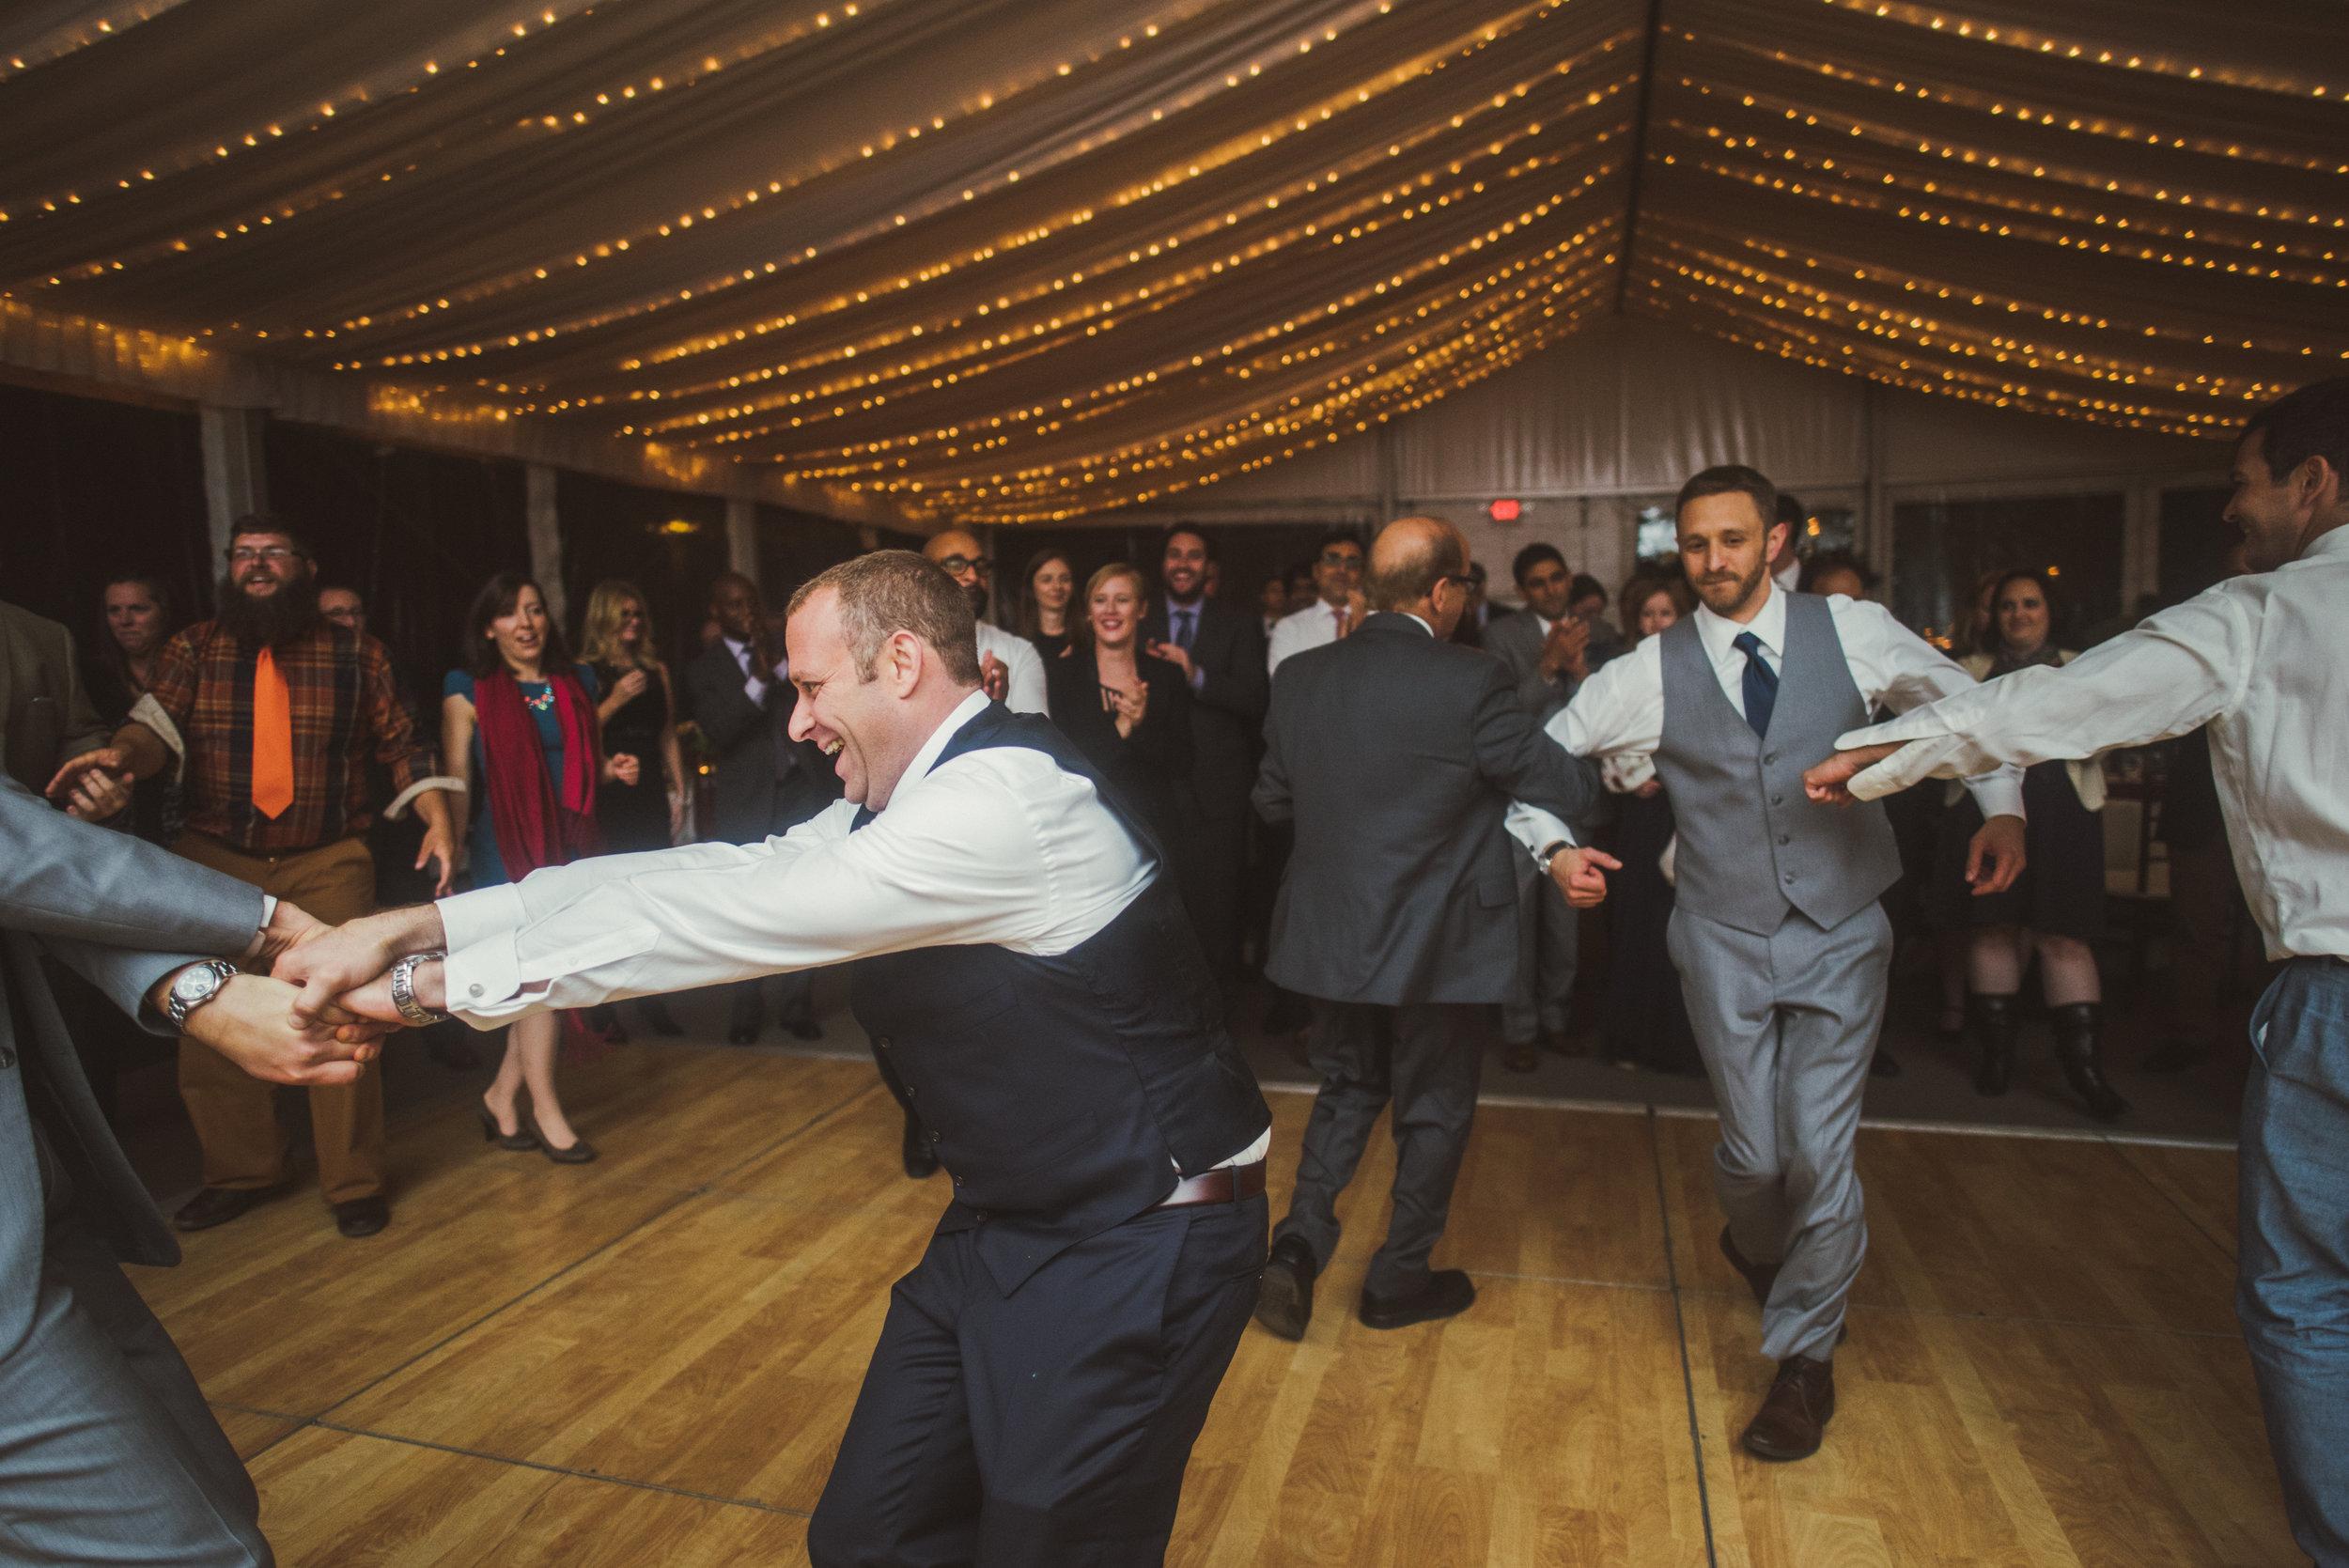 JACQUELINE & ANDREW WARSHAWER -BROOKMILL FARM FALL WEDDING - INTIMATE WEDDING PHOTOGRAPHER - TWOTWENTY by CHI-CHI AGBIM-677.jpg